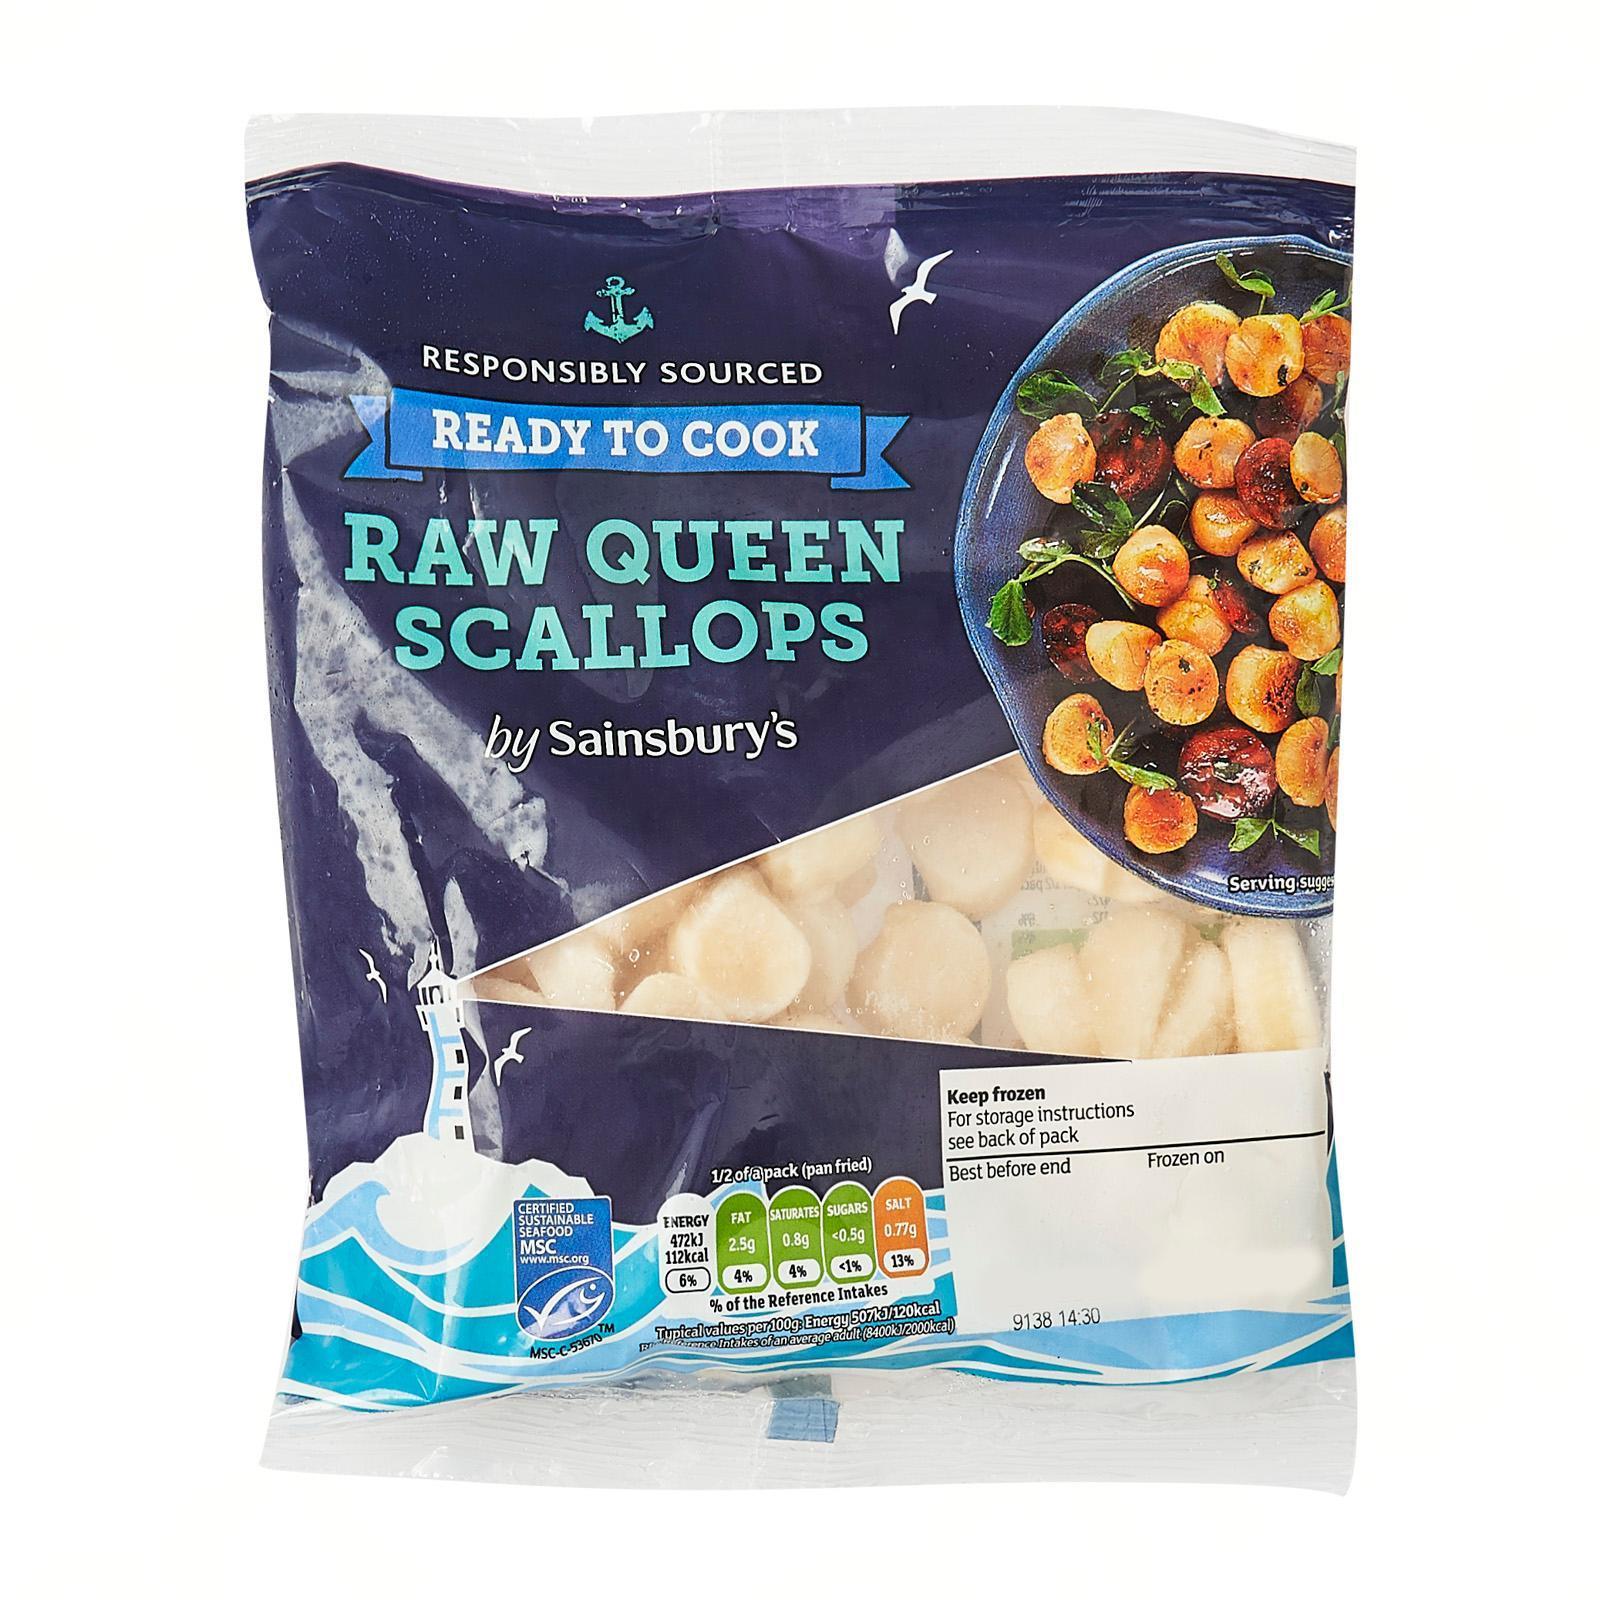 Sainsbury's Raw Patagonian Scallops - Frozen